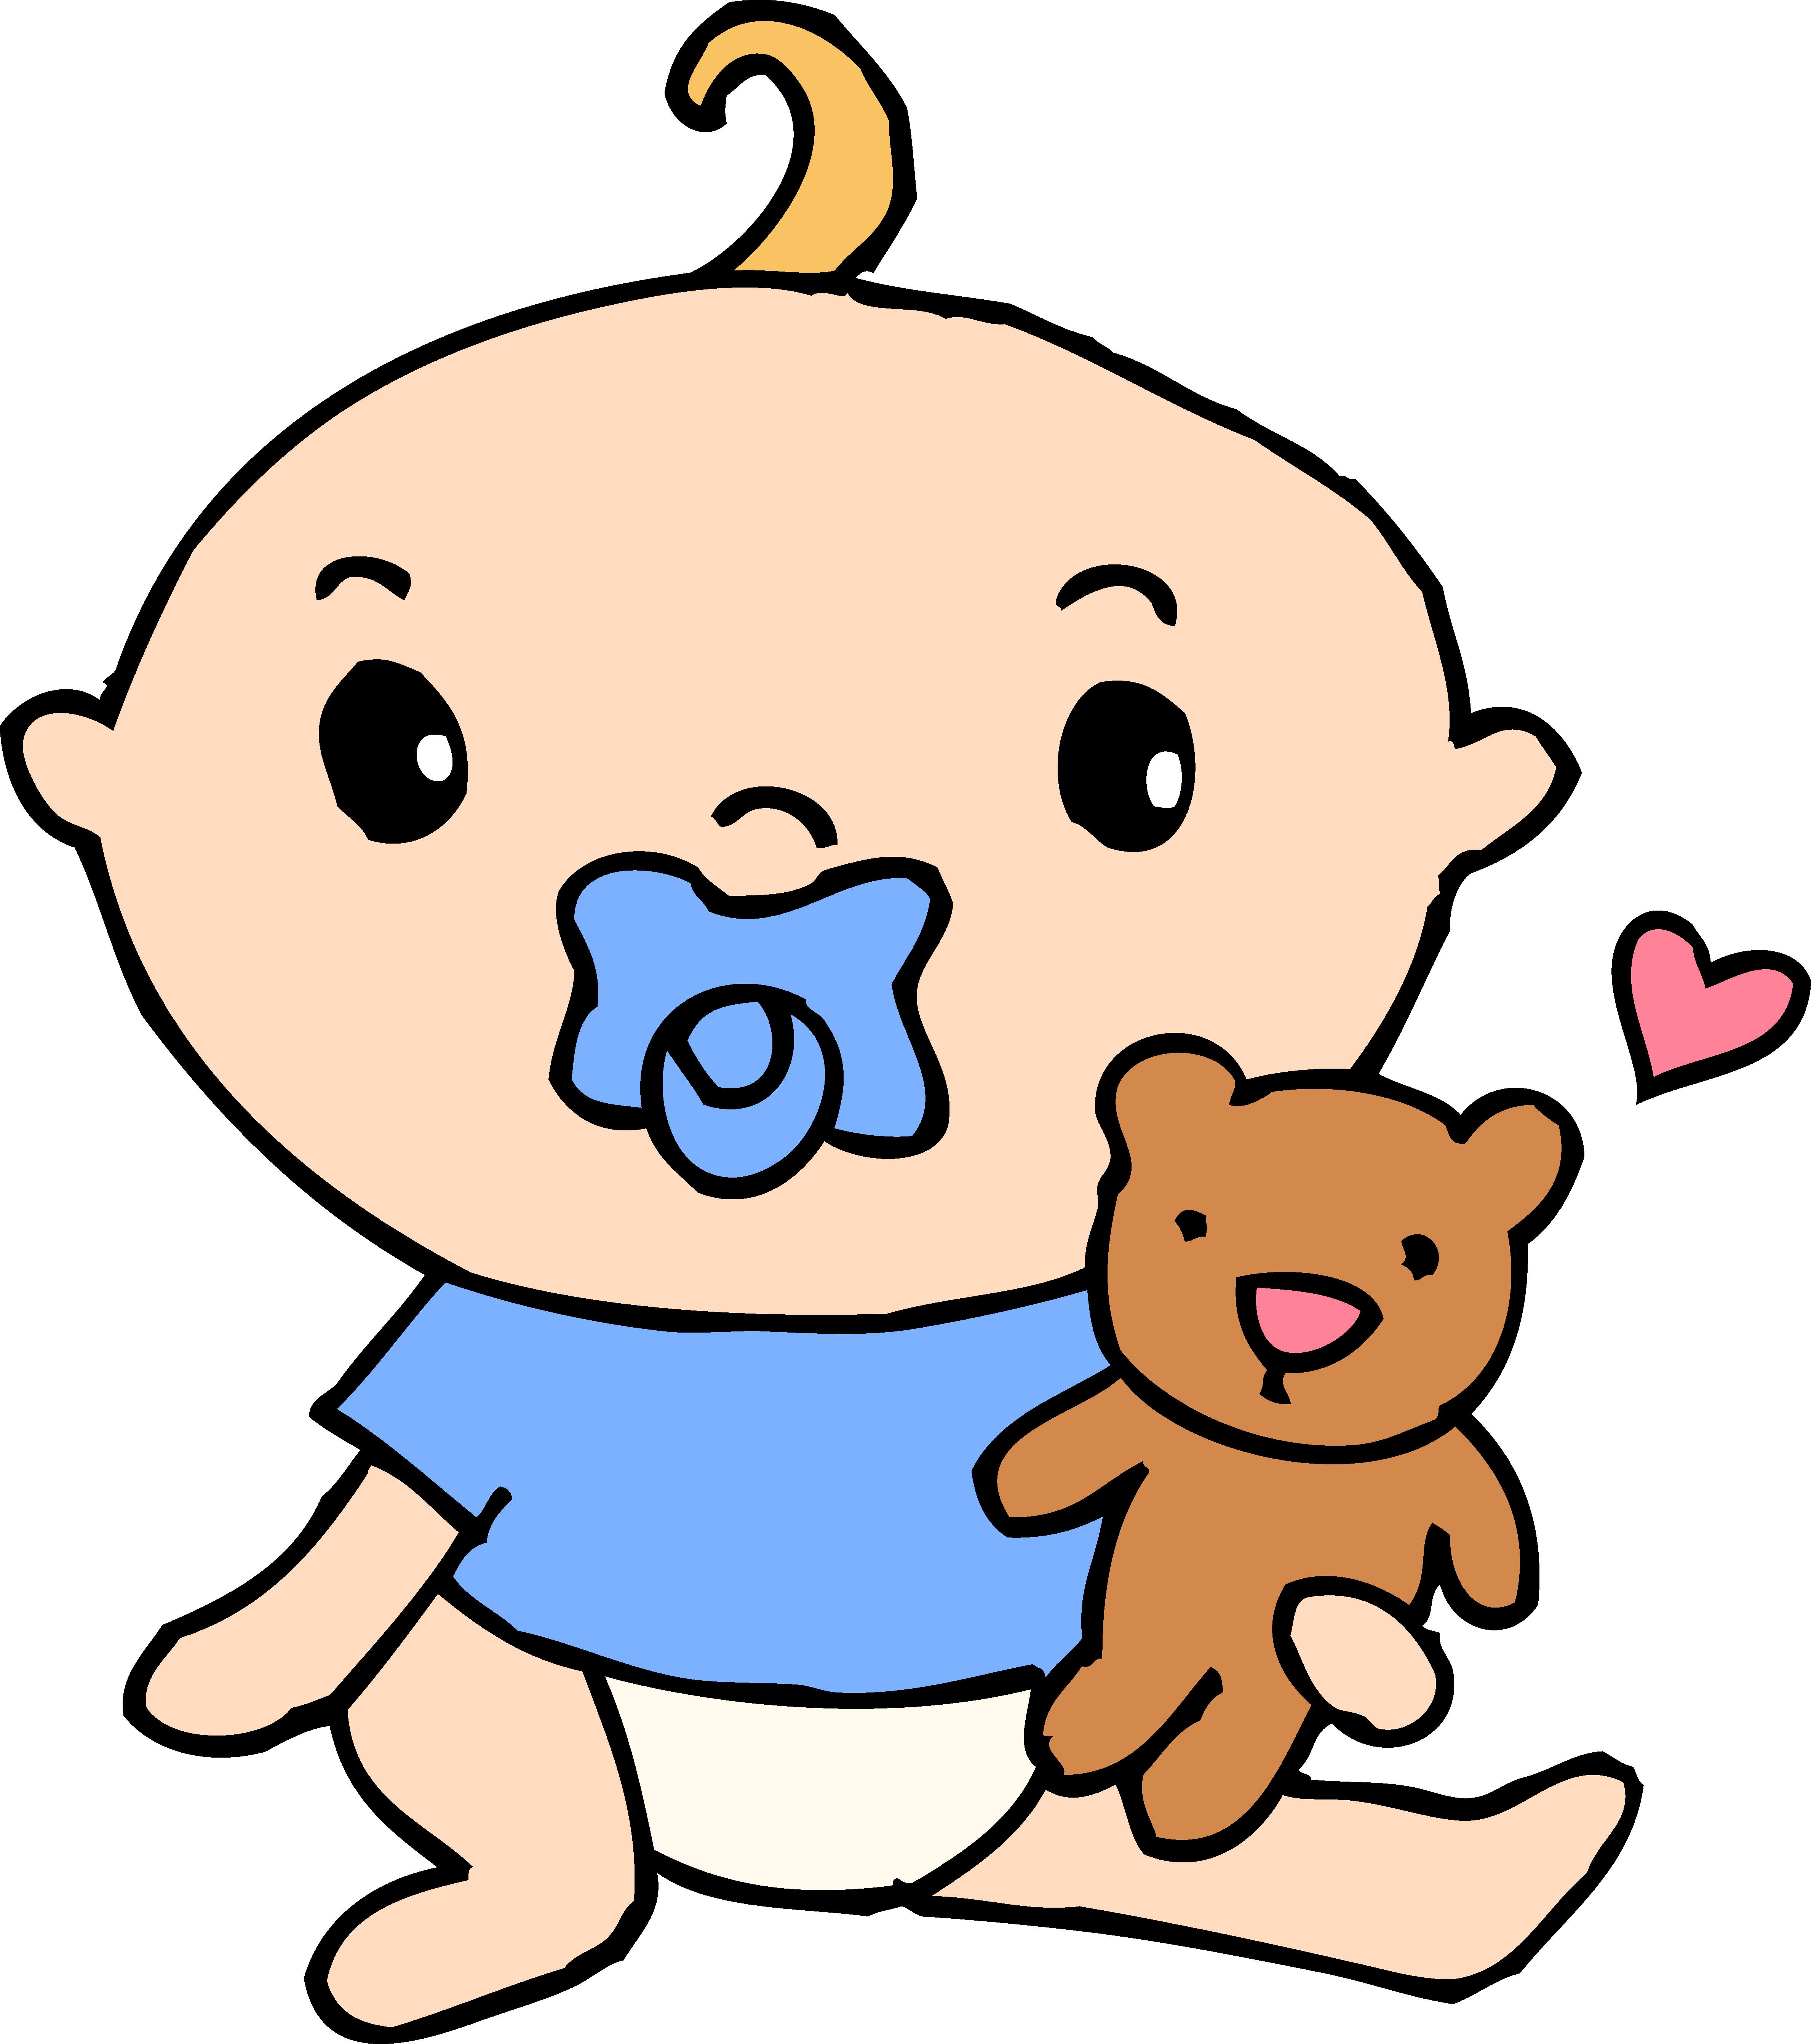 Newborn Clipart - Newborn Clipart